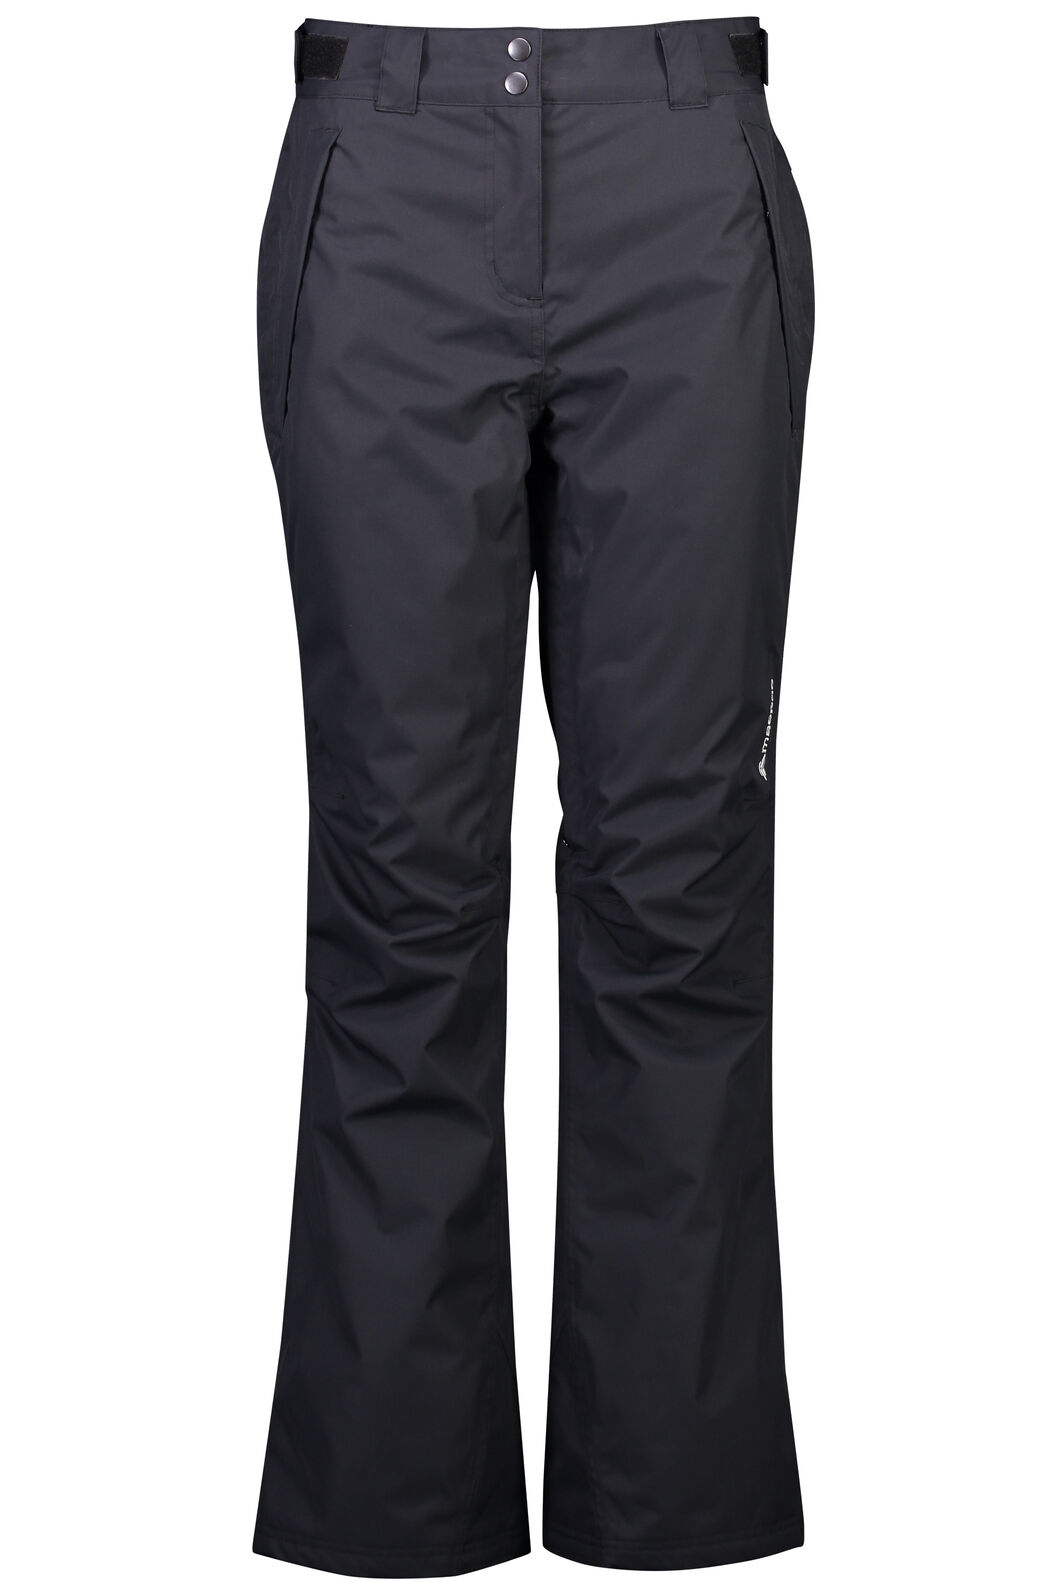 Macpac Powder Reflex™ Ski Pants — Women's, Black, hi-res